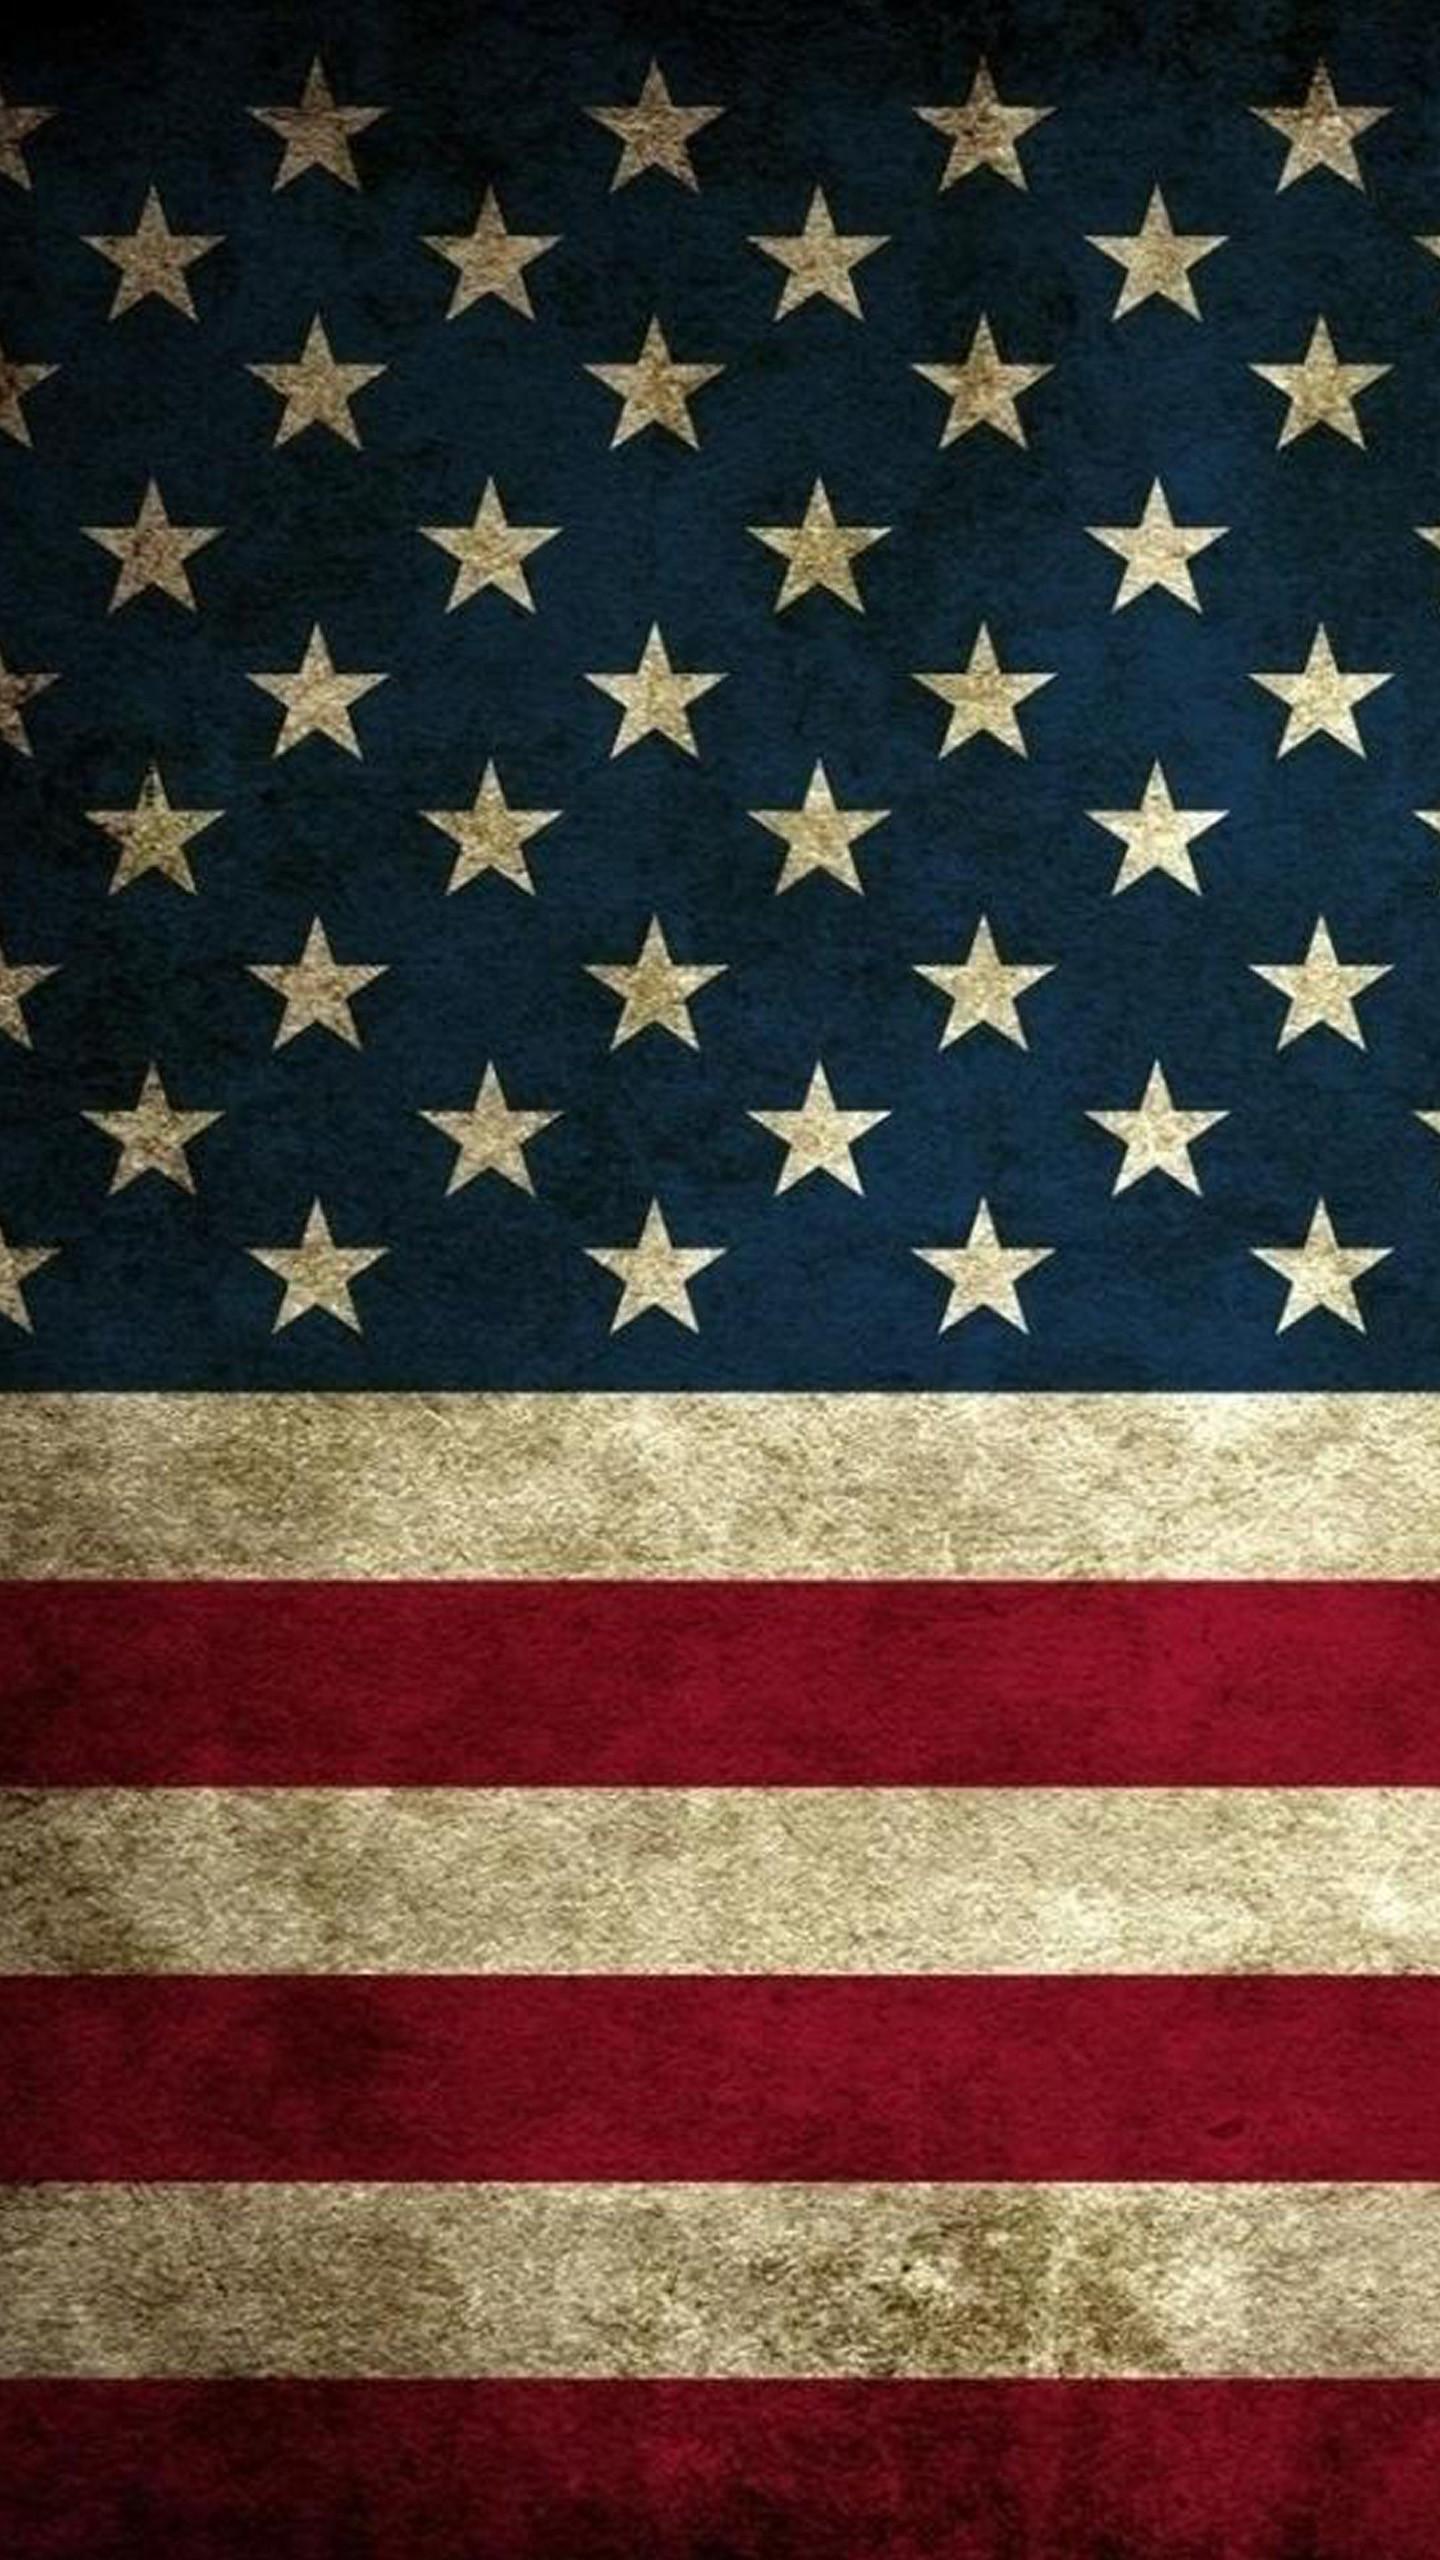 NMA-74: American Flag Wallpapers for Desktop